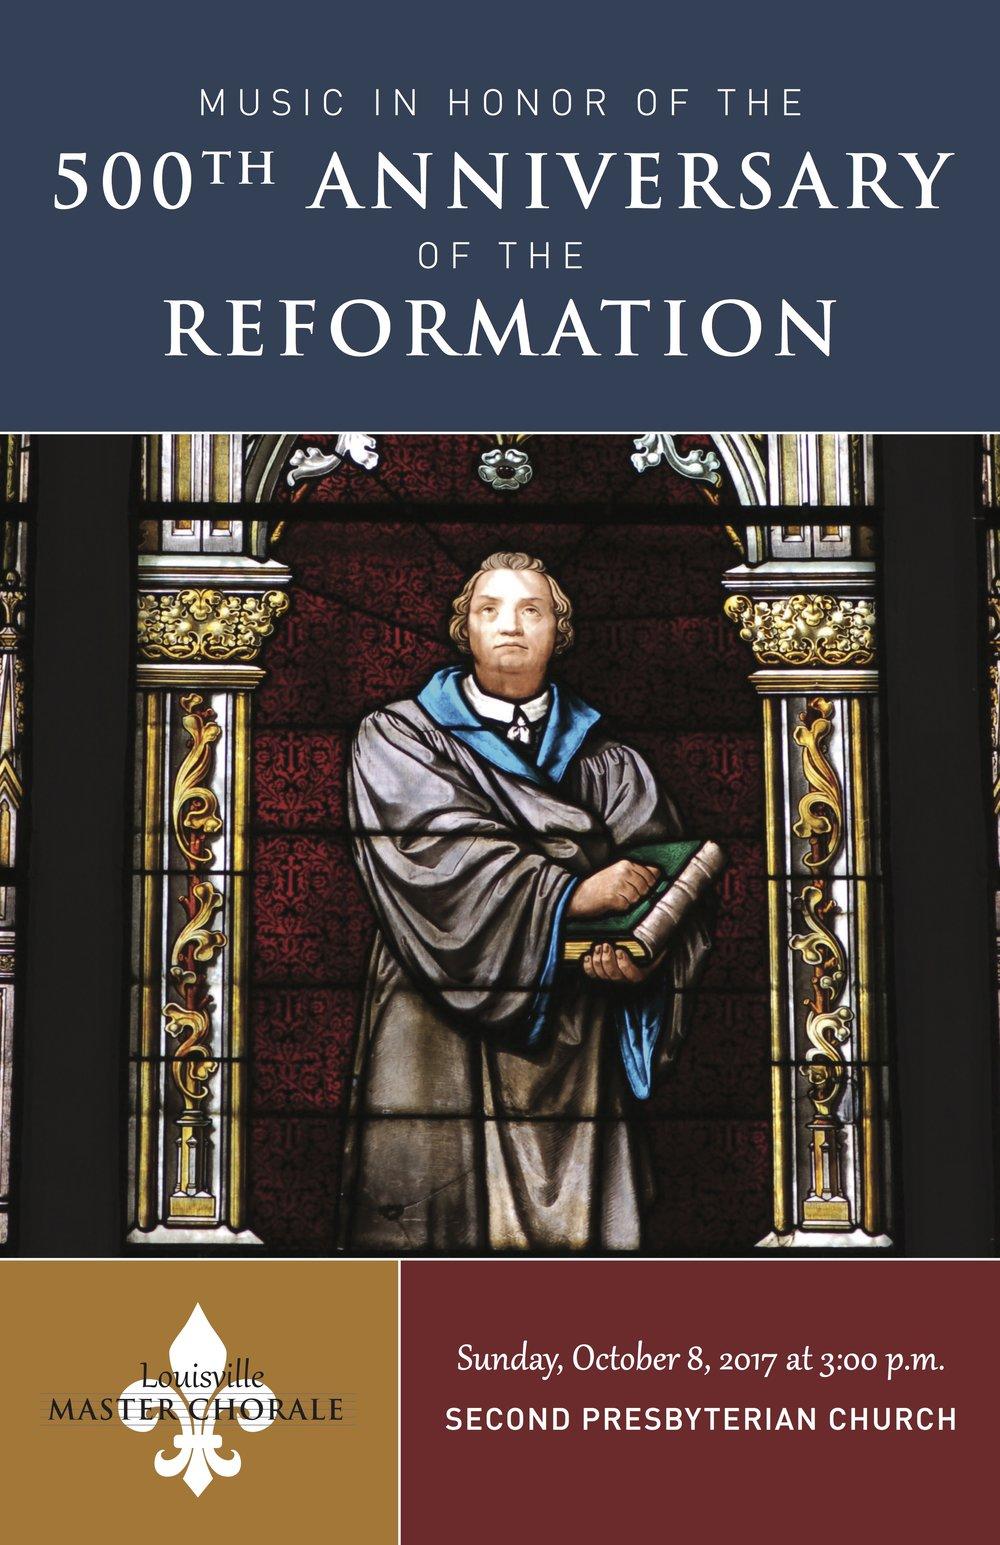 reformation music poster.jpg